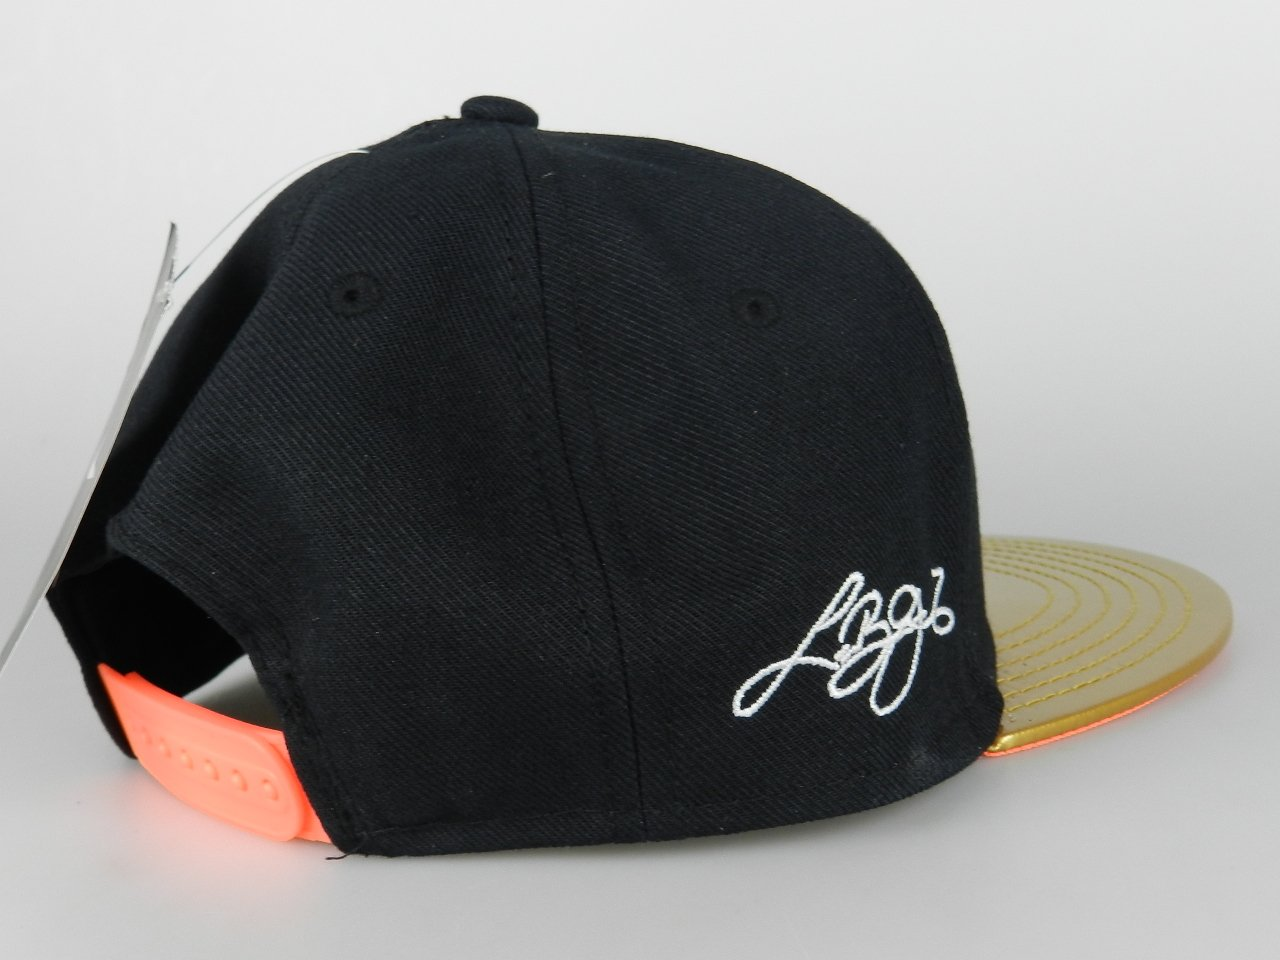 Amazon.com  Nike Lebron James LBJ XI Elite Snapback Adjustable Cap Hat  YOUTH UNISEX  Sports   Outdoors 233247bb397